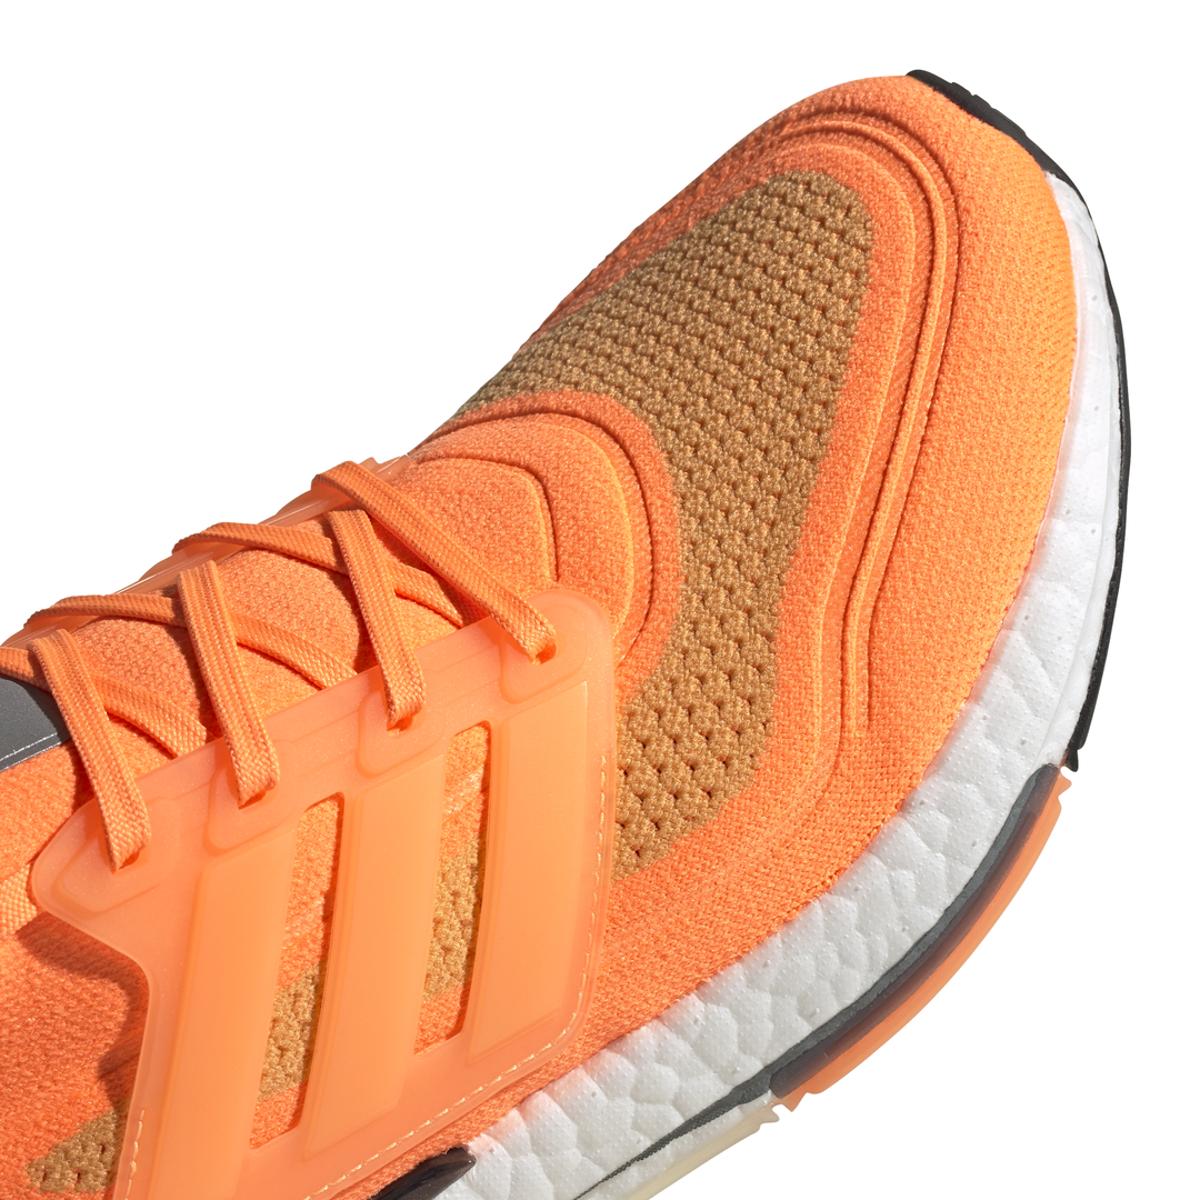 Bilde av Adidas  Ultraboost 21 mens orange FZ1920